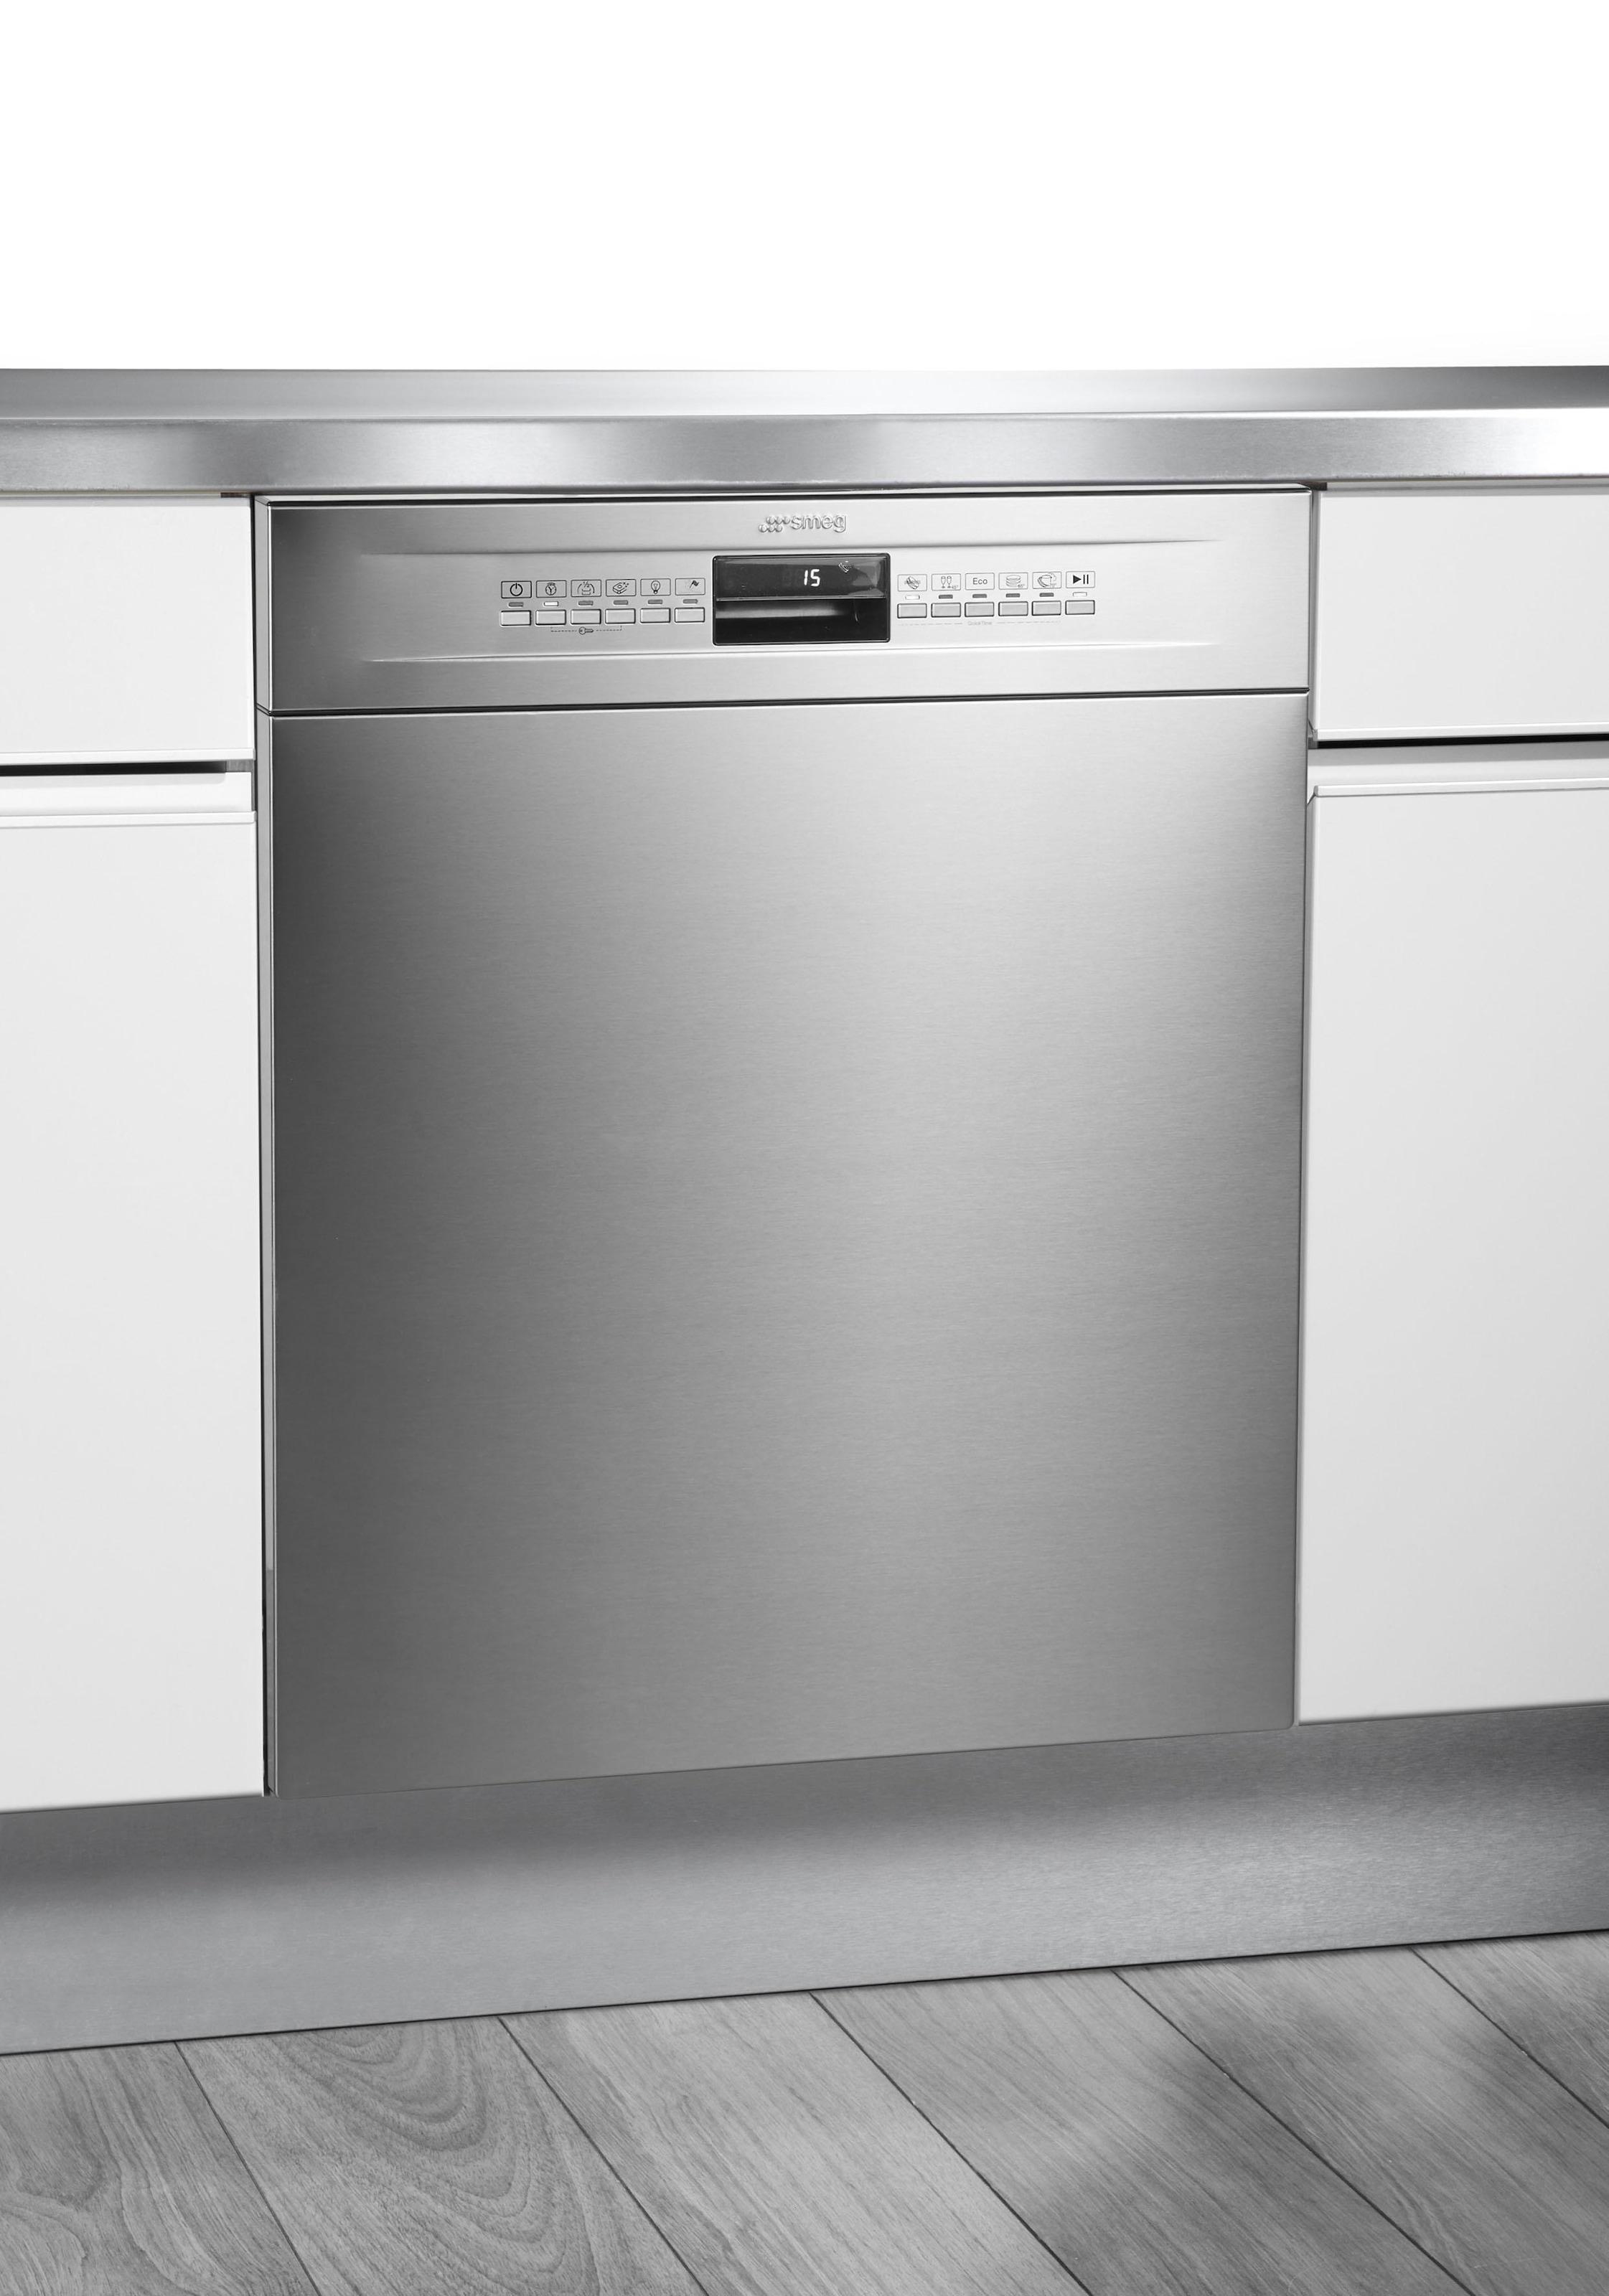 Smeg Kühlschrank Black Velvet : Smeg küchengeräte online kaufen smeg bei baur